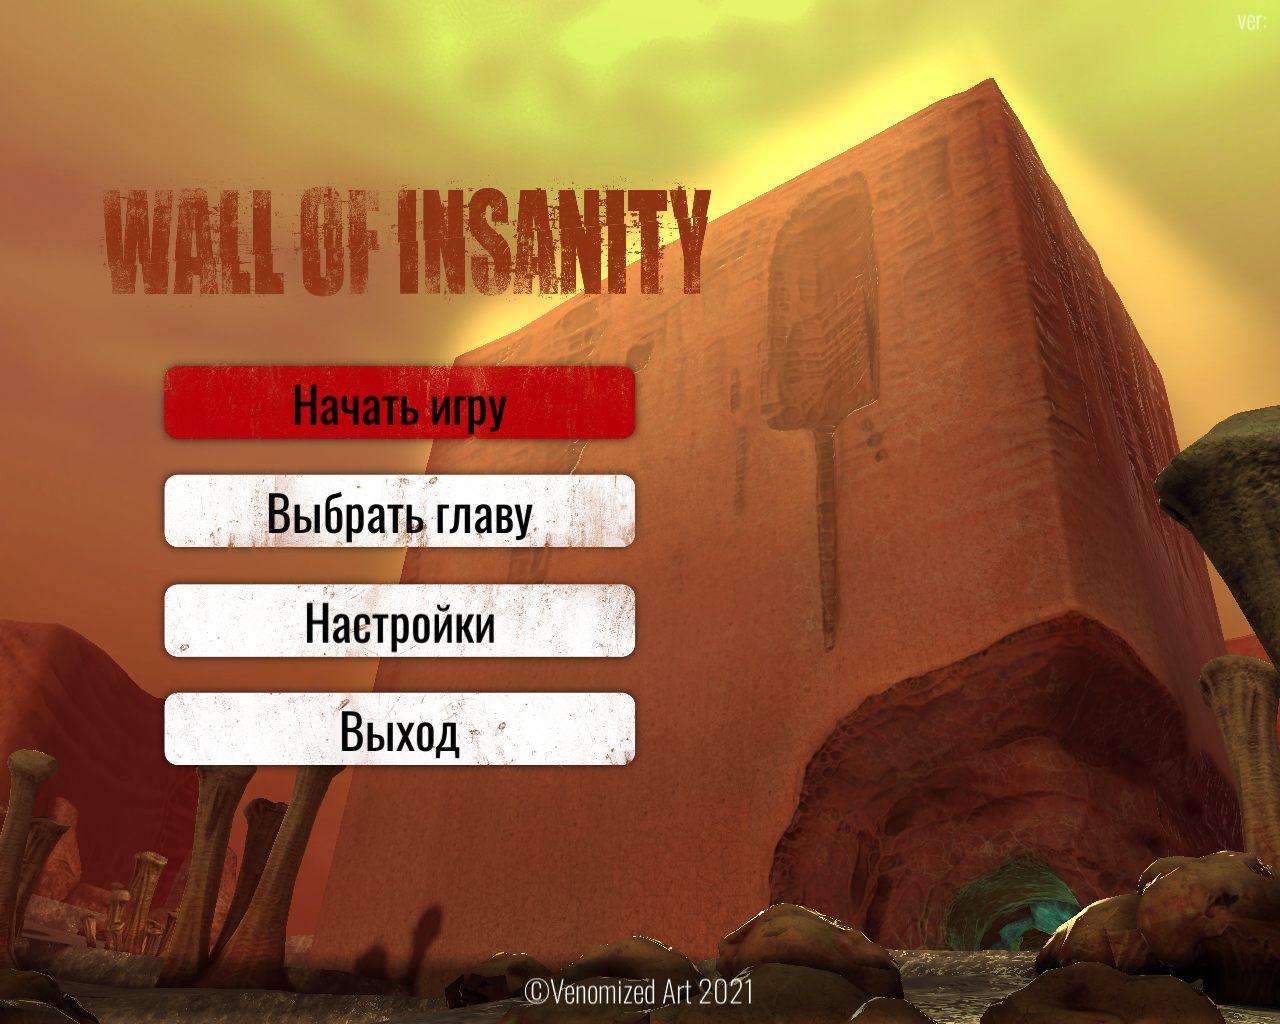 Wall Of Insanity 2021-08-21 18-44-25-17.bmp.jpg